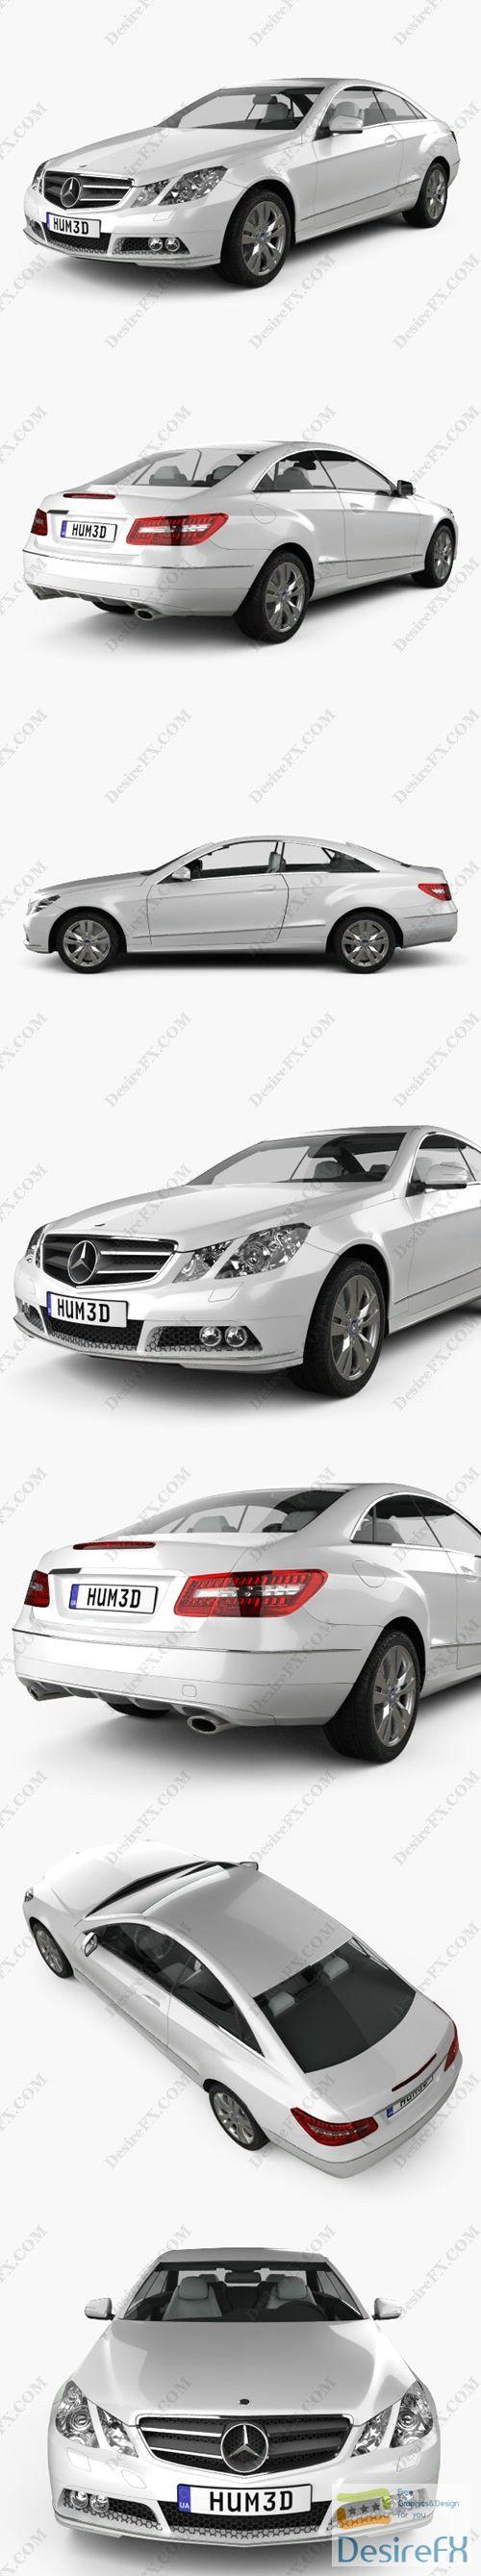 Mercedes-Benz E-Class coupe 2011 3D Model